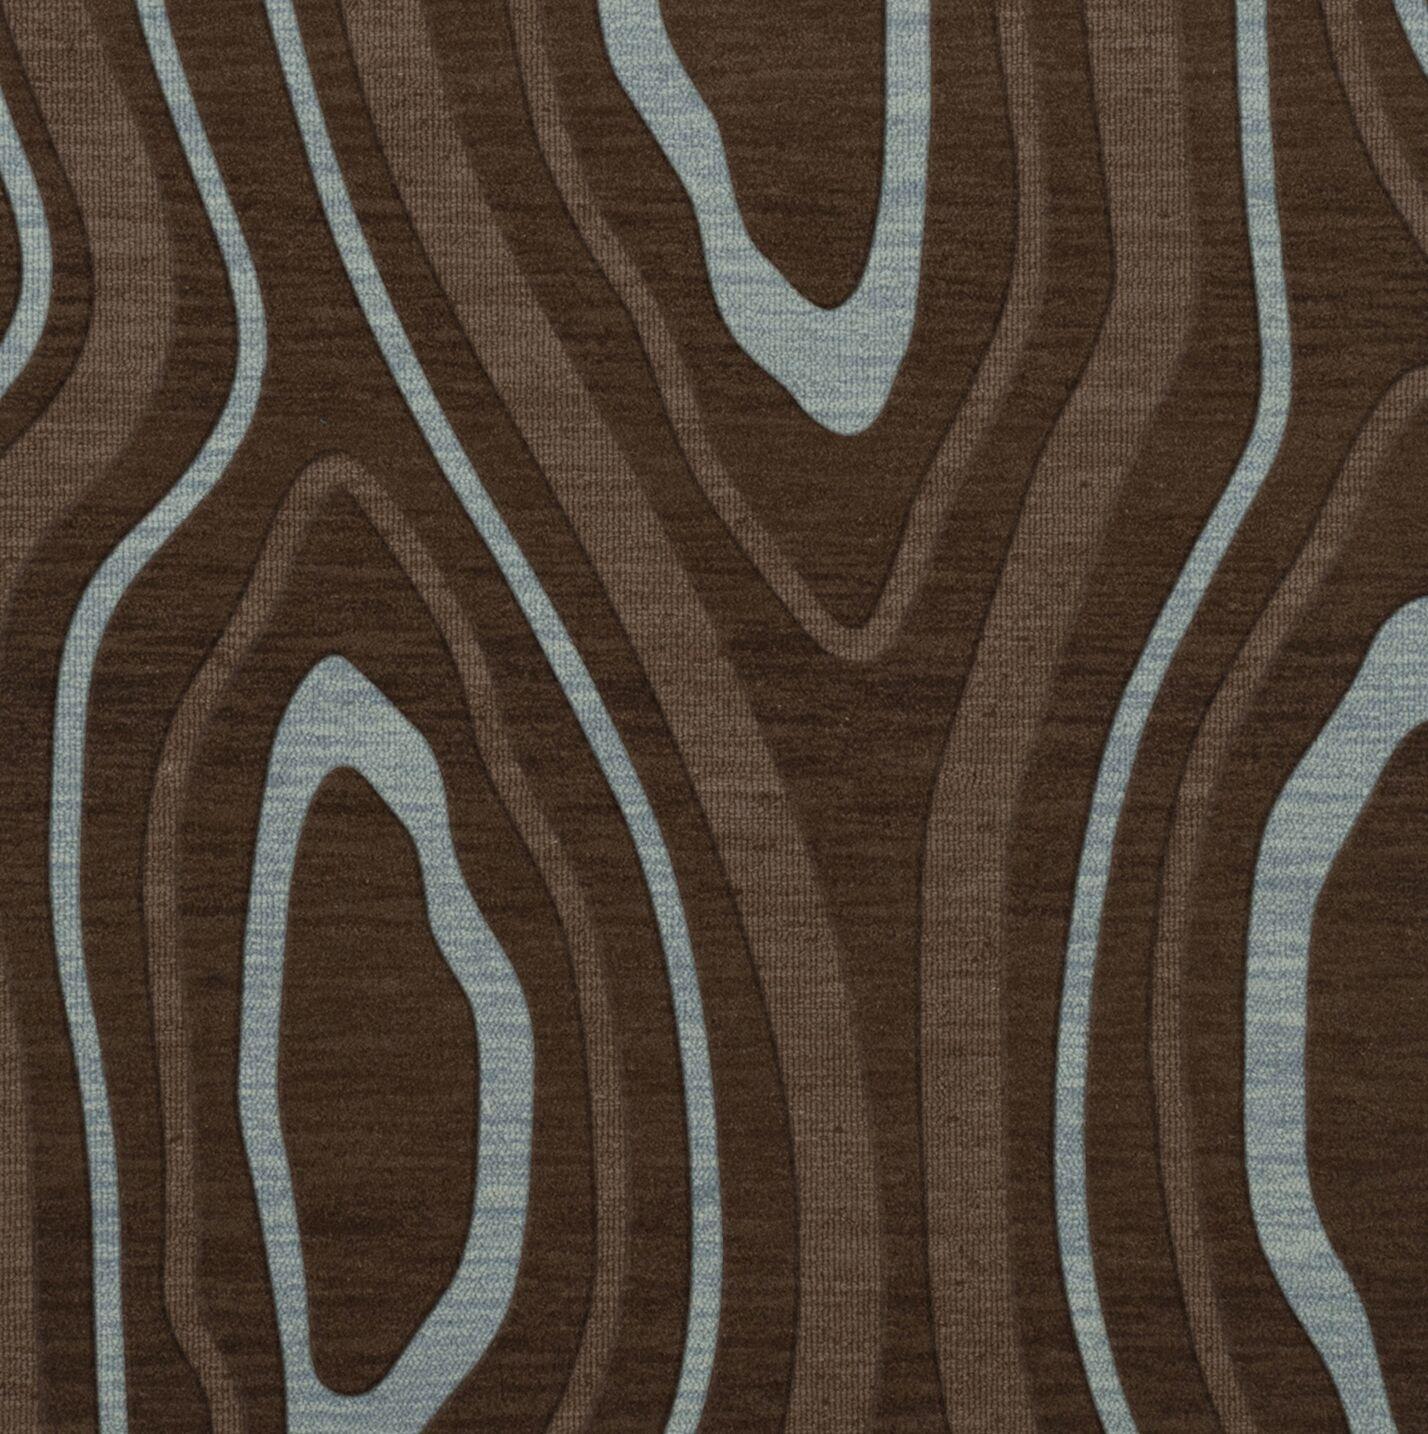 Sarahi Wool Cork Area Rug Rug Size: Square 8'